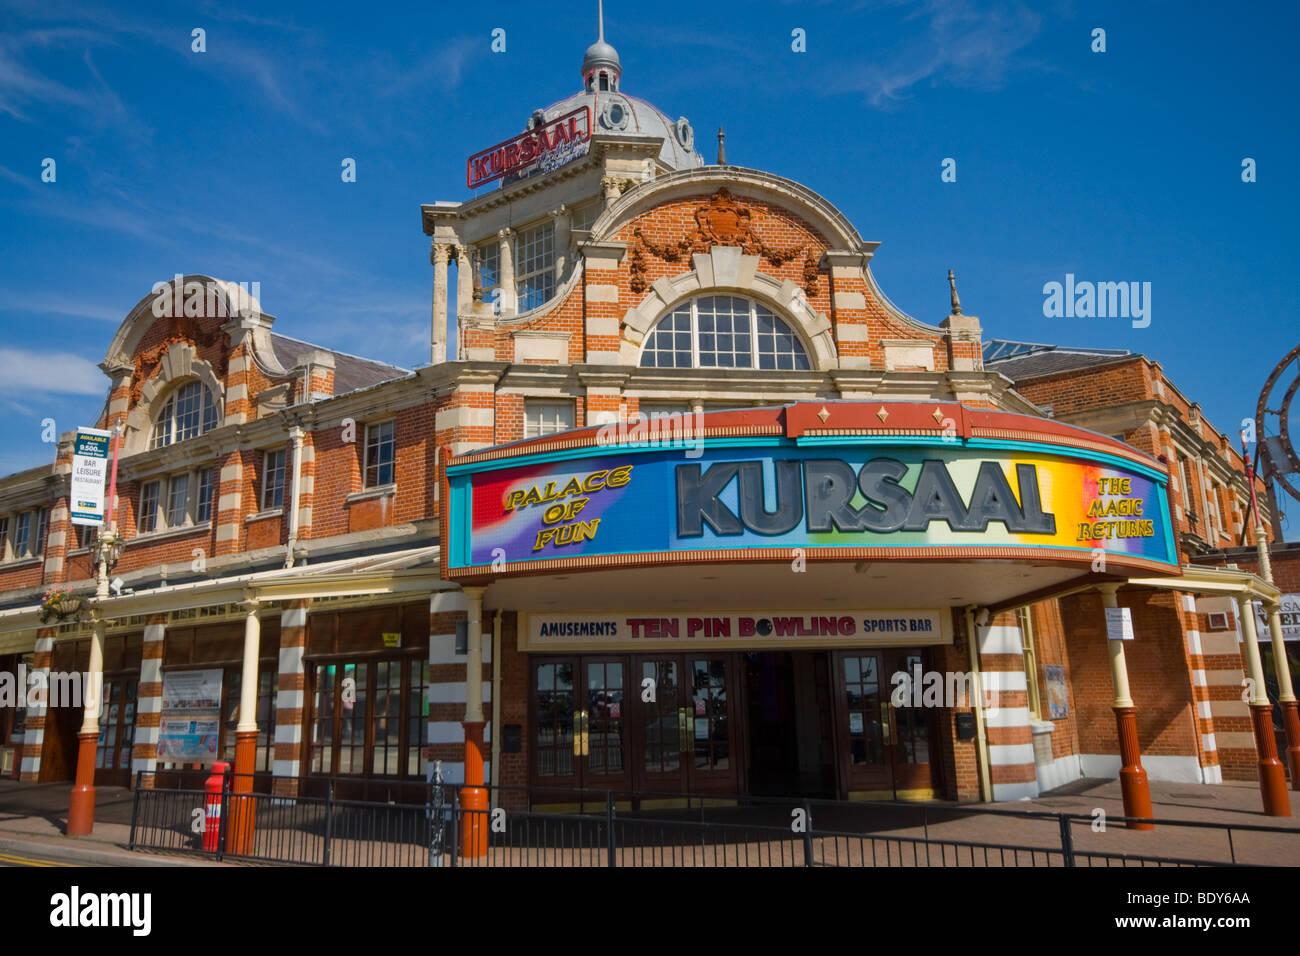 The Kursaal, Southend-on-Sea - Stock Image